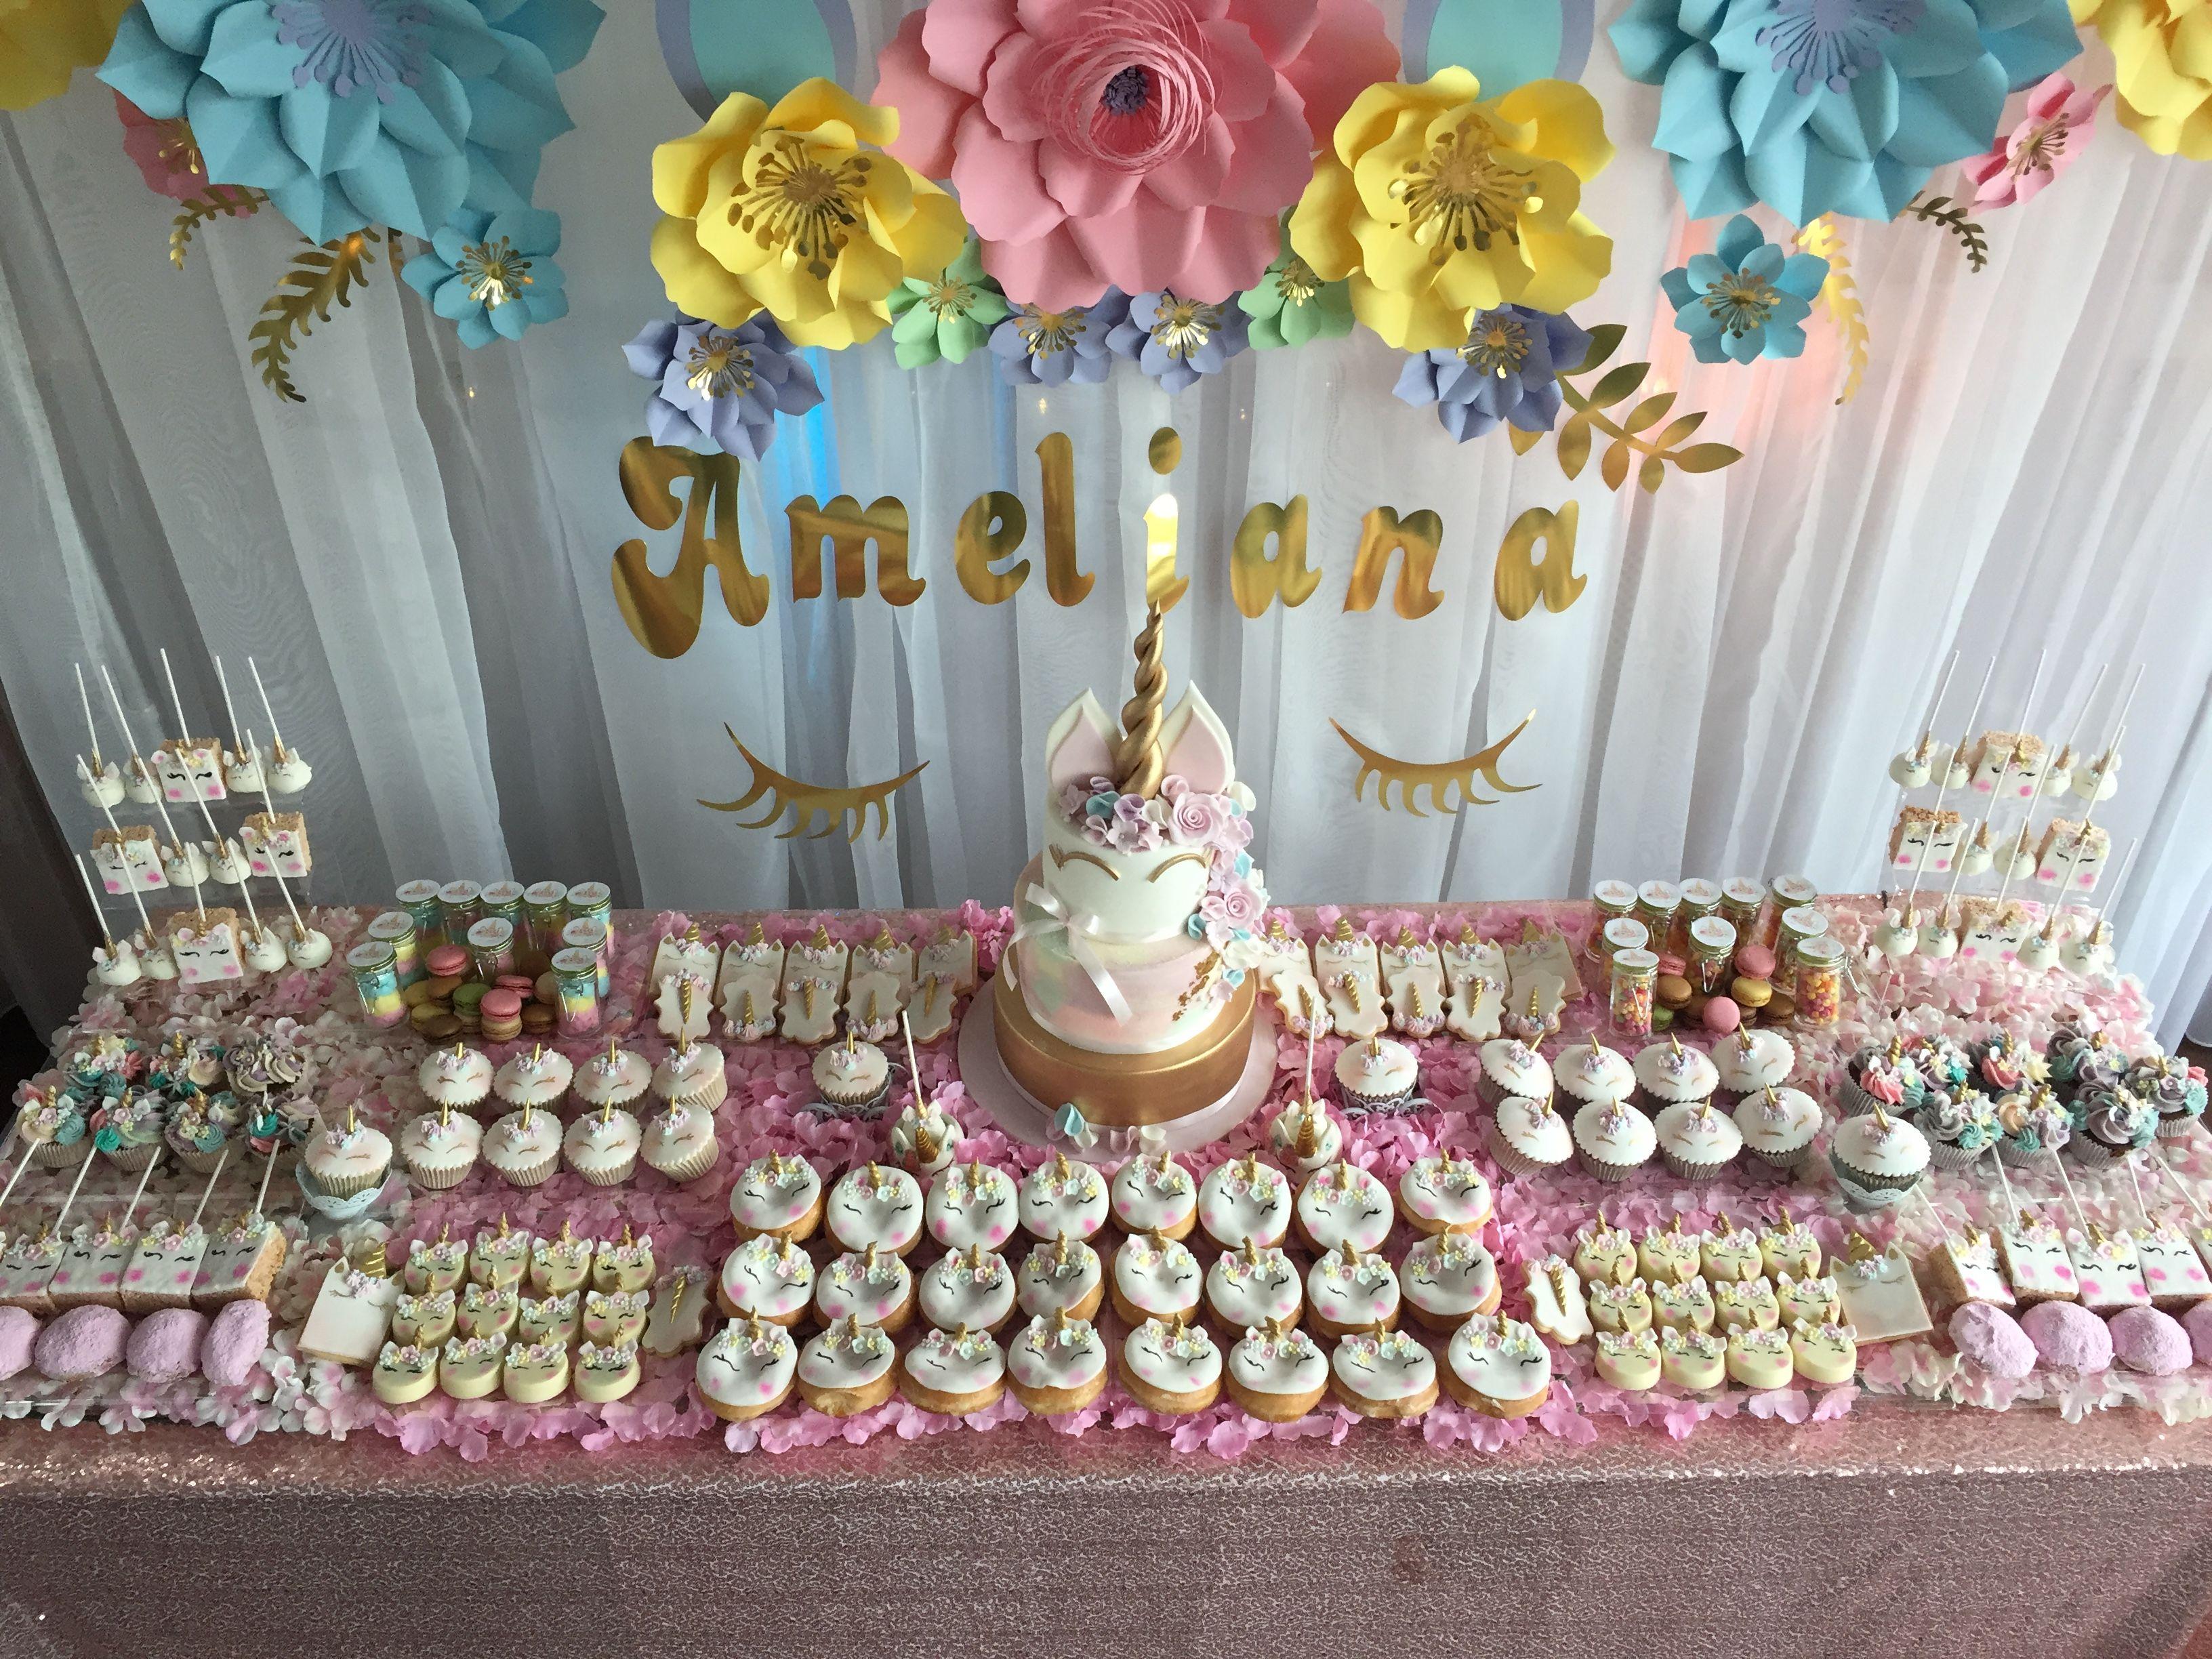 Pin By Ritesh Mohta On Decor Unicorn Birthday Cake Dessert Table Birthday Party Unicorn Cake Decorations